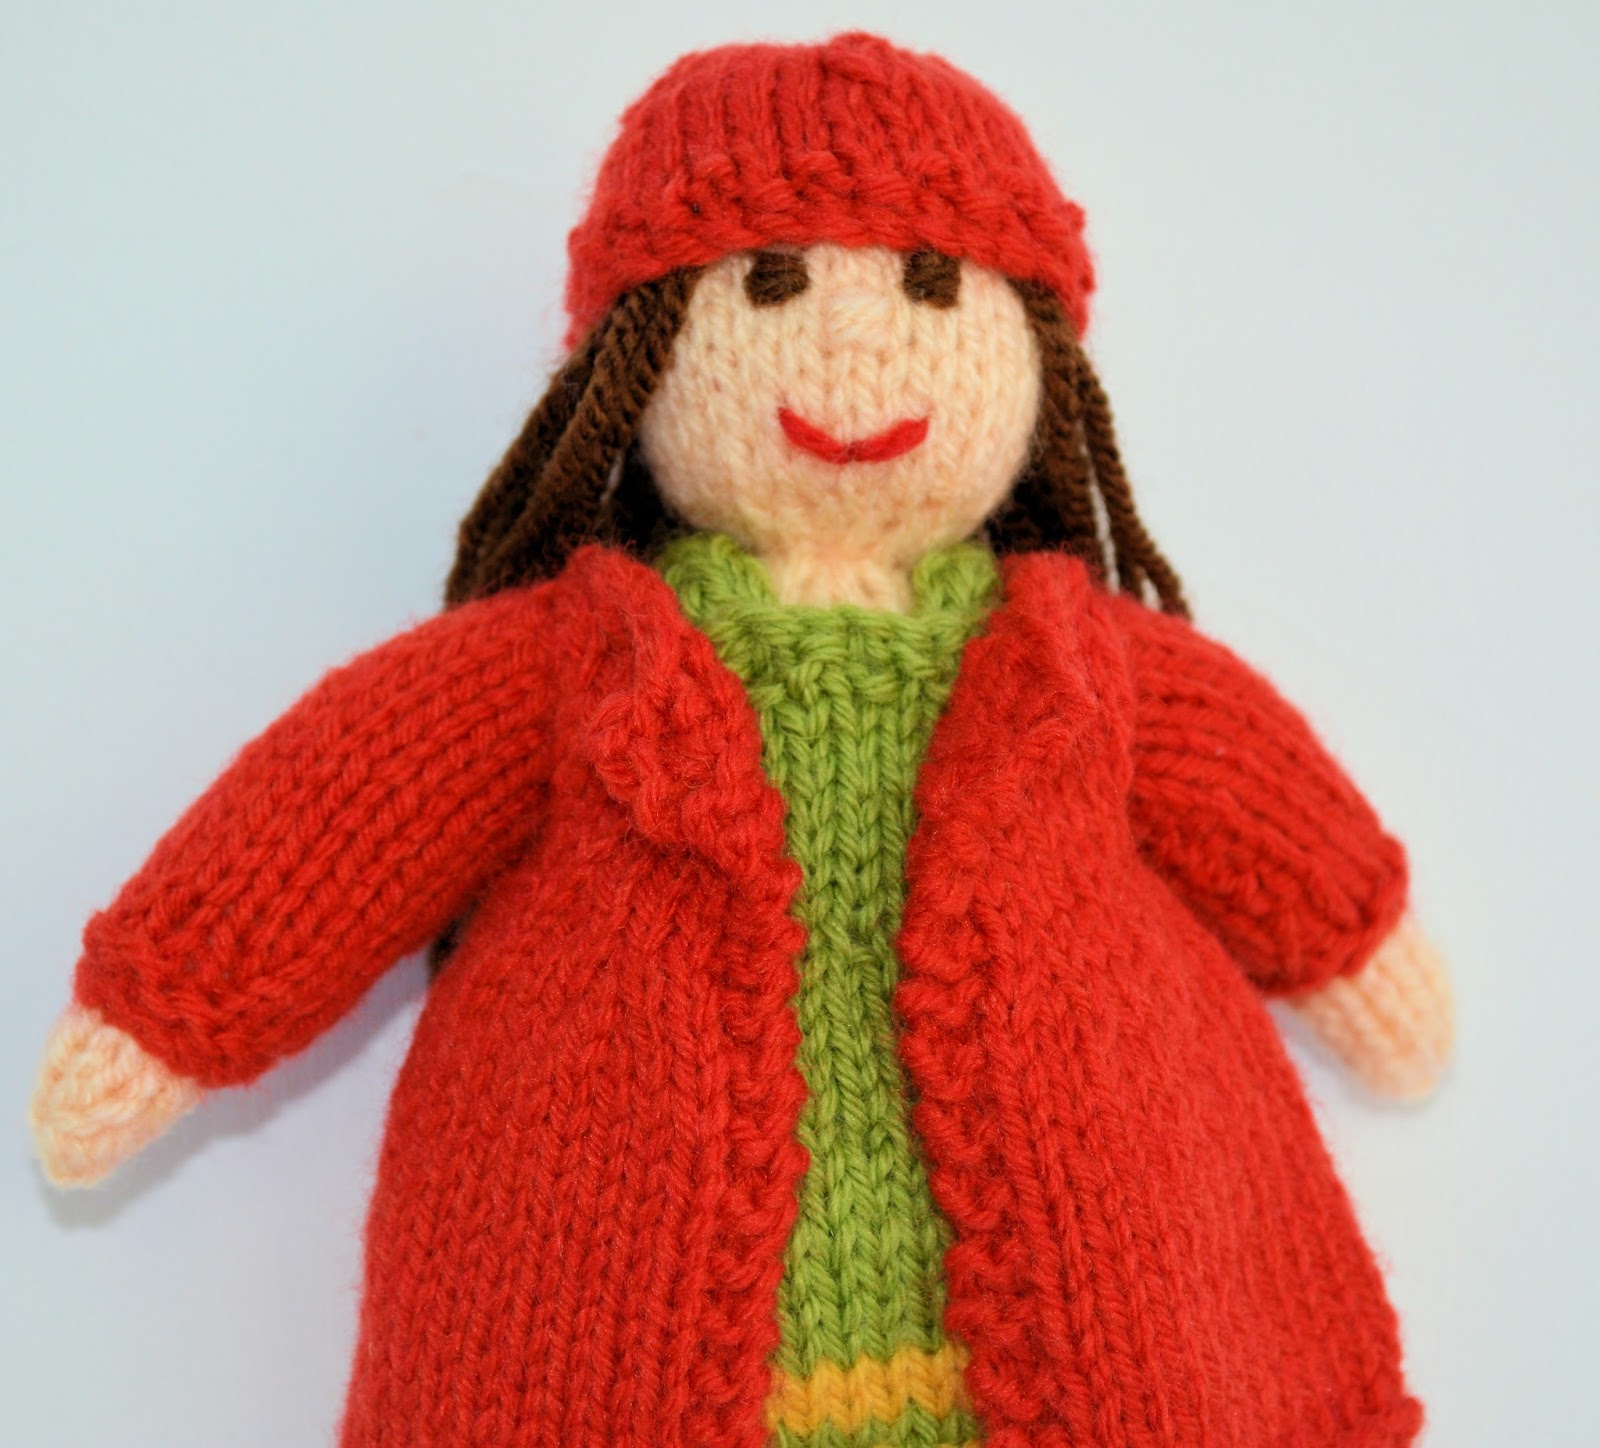 Daisy Doll Knitting Pattern : Edith Grace Designs: July 2015